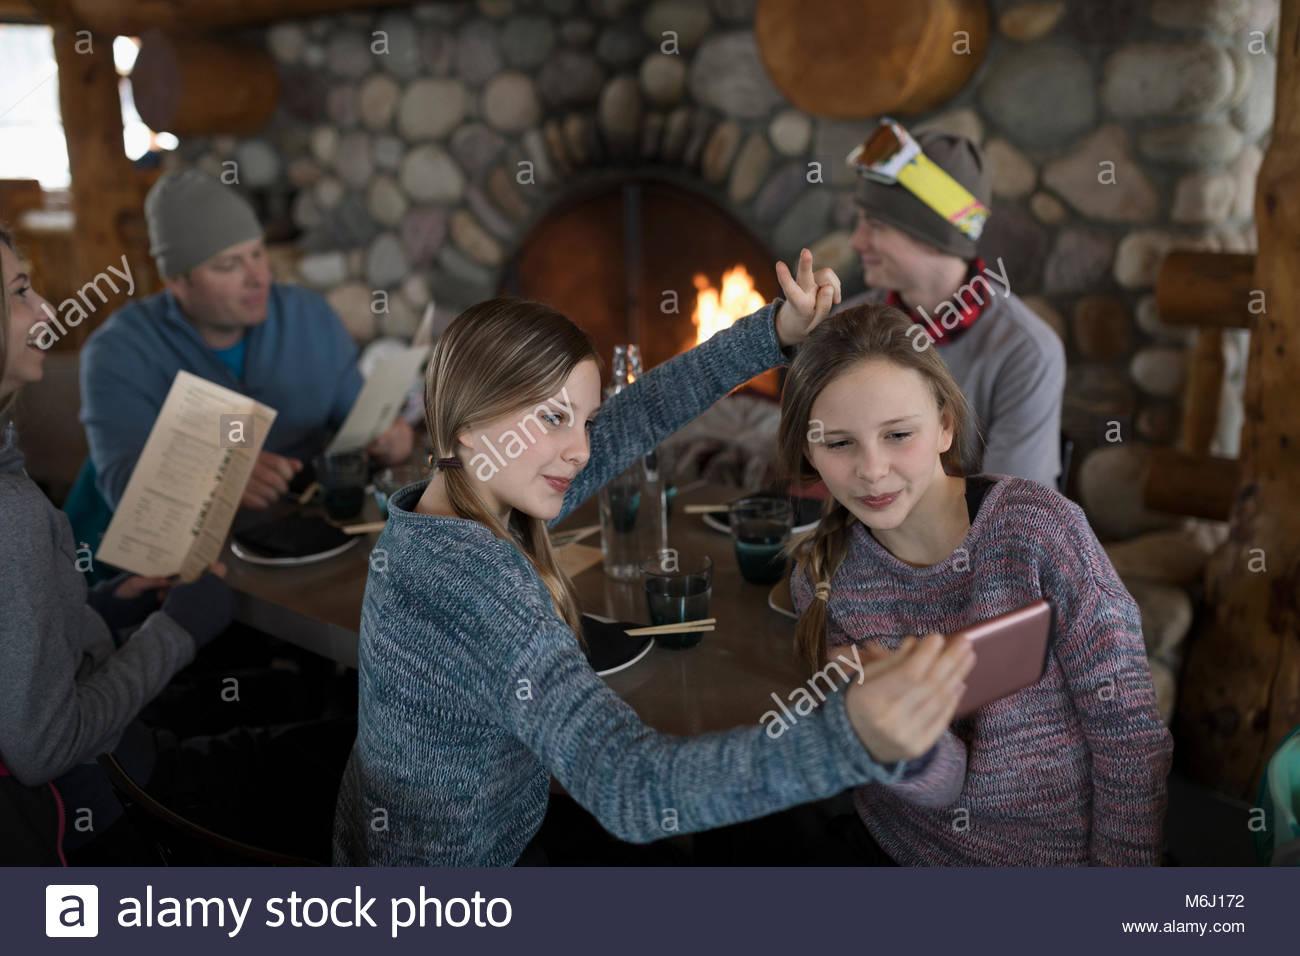 Twin sister skiers taking selfie at fireside ski resort lodge apres-ski - Stock Image